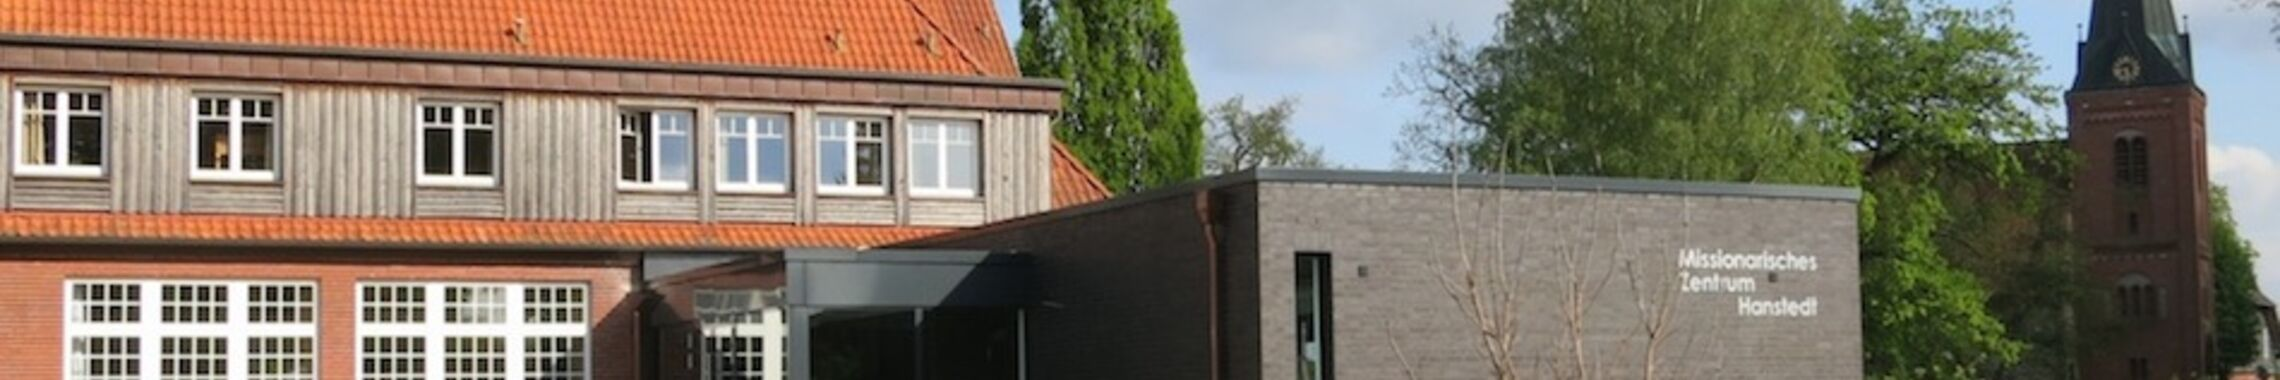 Gebäude_Titel